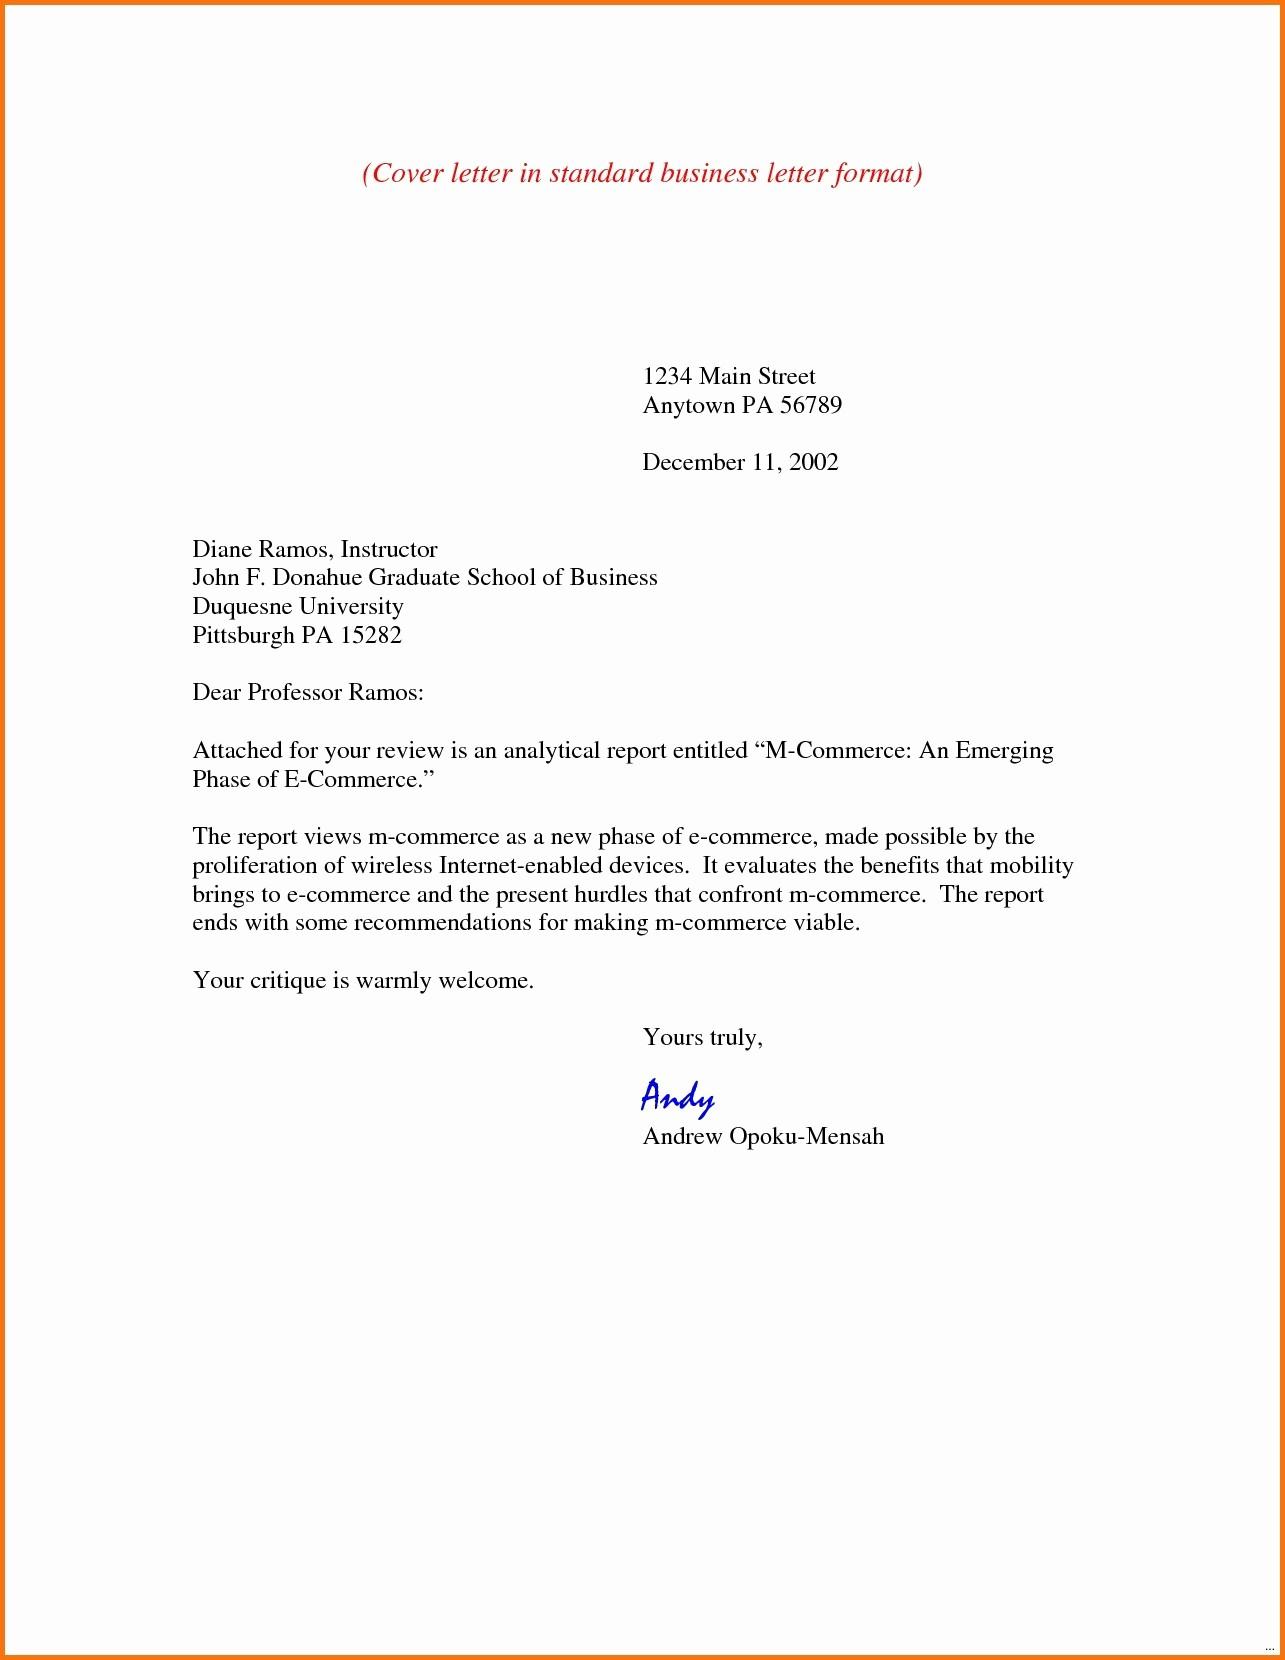 Standard Business Letter format Template Inspirational Free Printable Standard Business Letter format Template